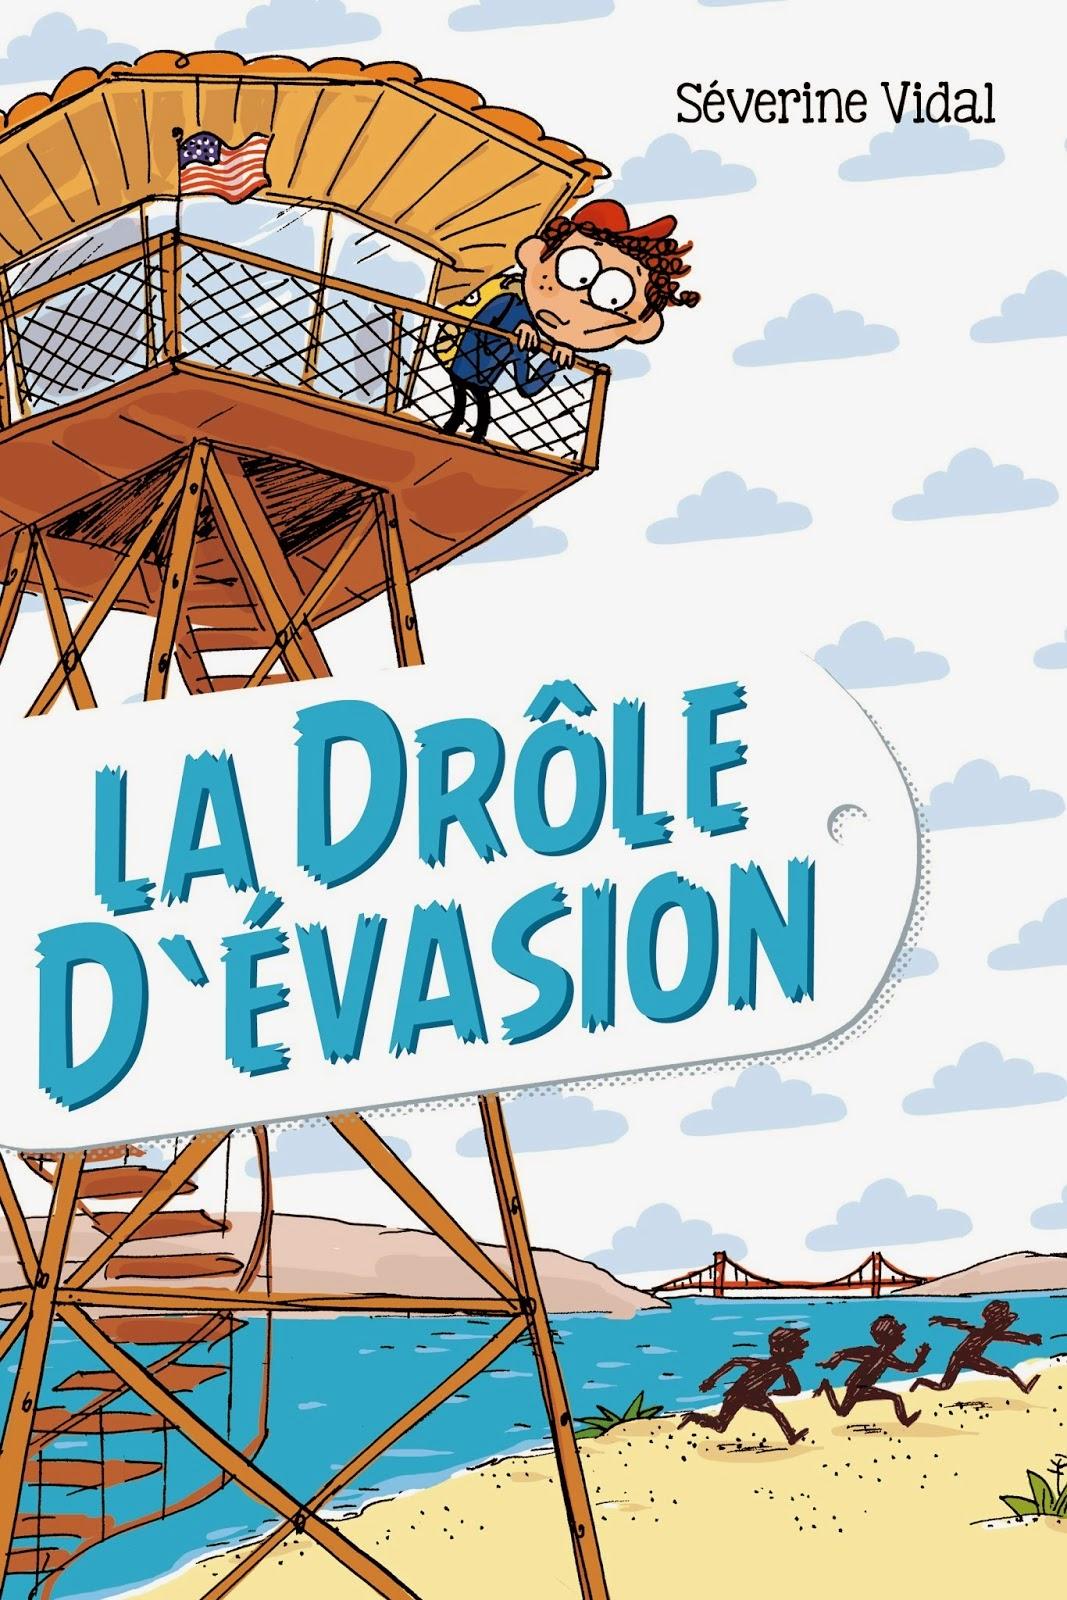 http://lesouffledesmots.blogspot.fr/2014/07/la-drole-devasion-severine-vidal.html